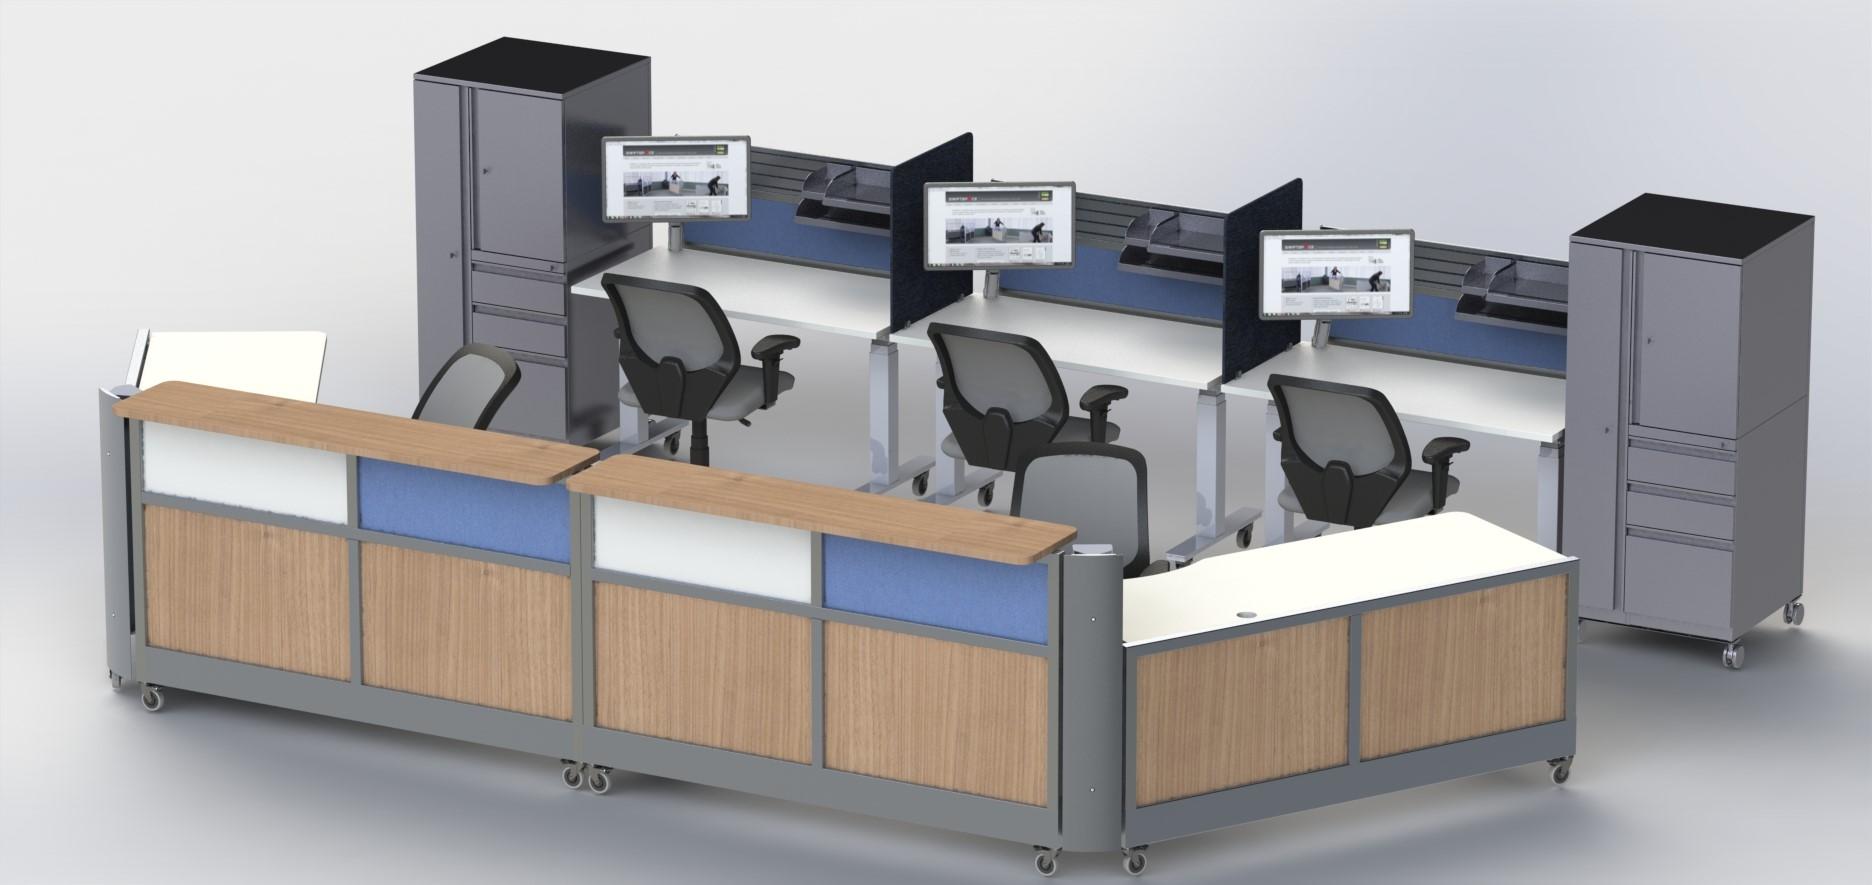 Swiftspace NurseStation